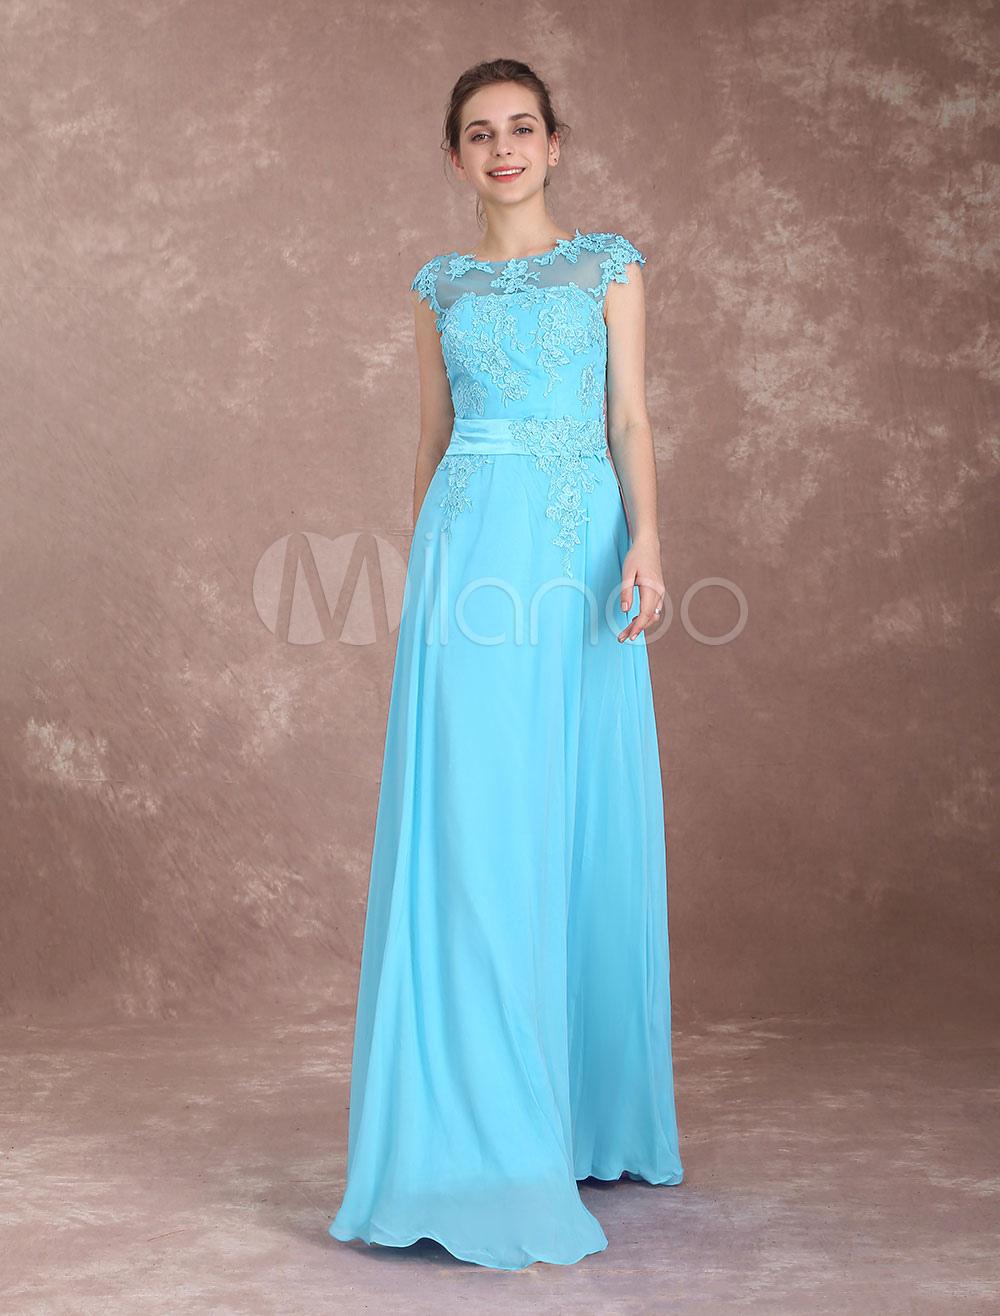 Prom Dresses Long Chiffon Backless Evening Dress Aqua Lace Applique ...